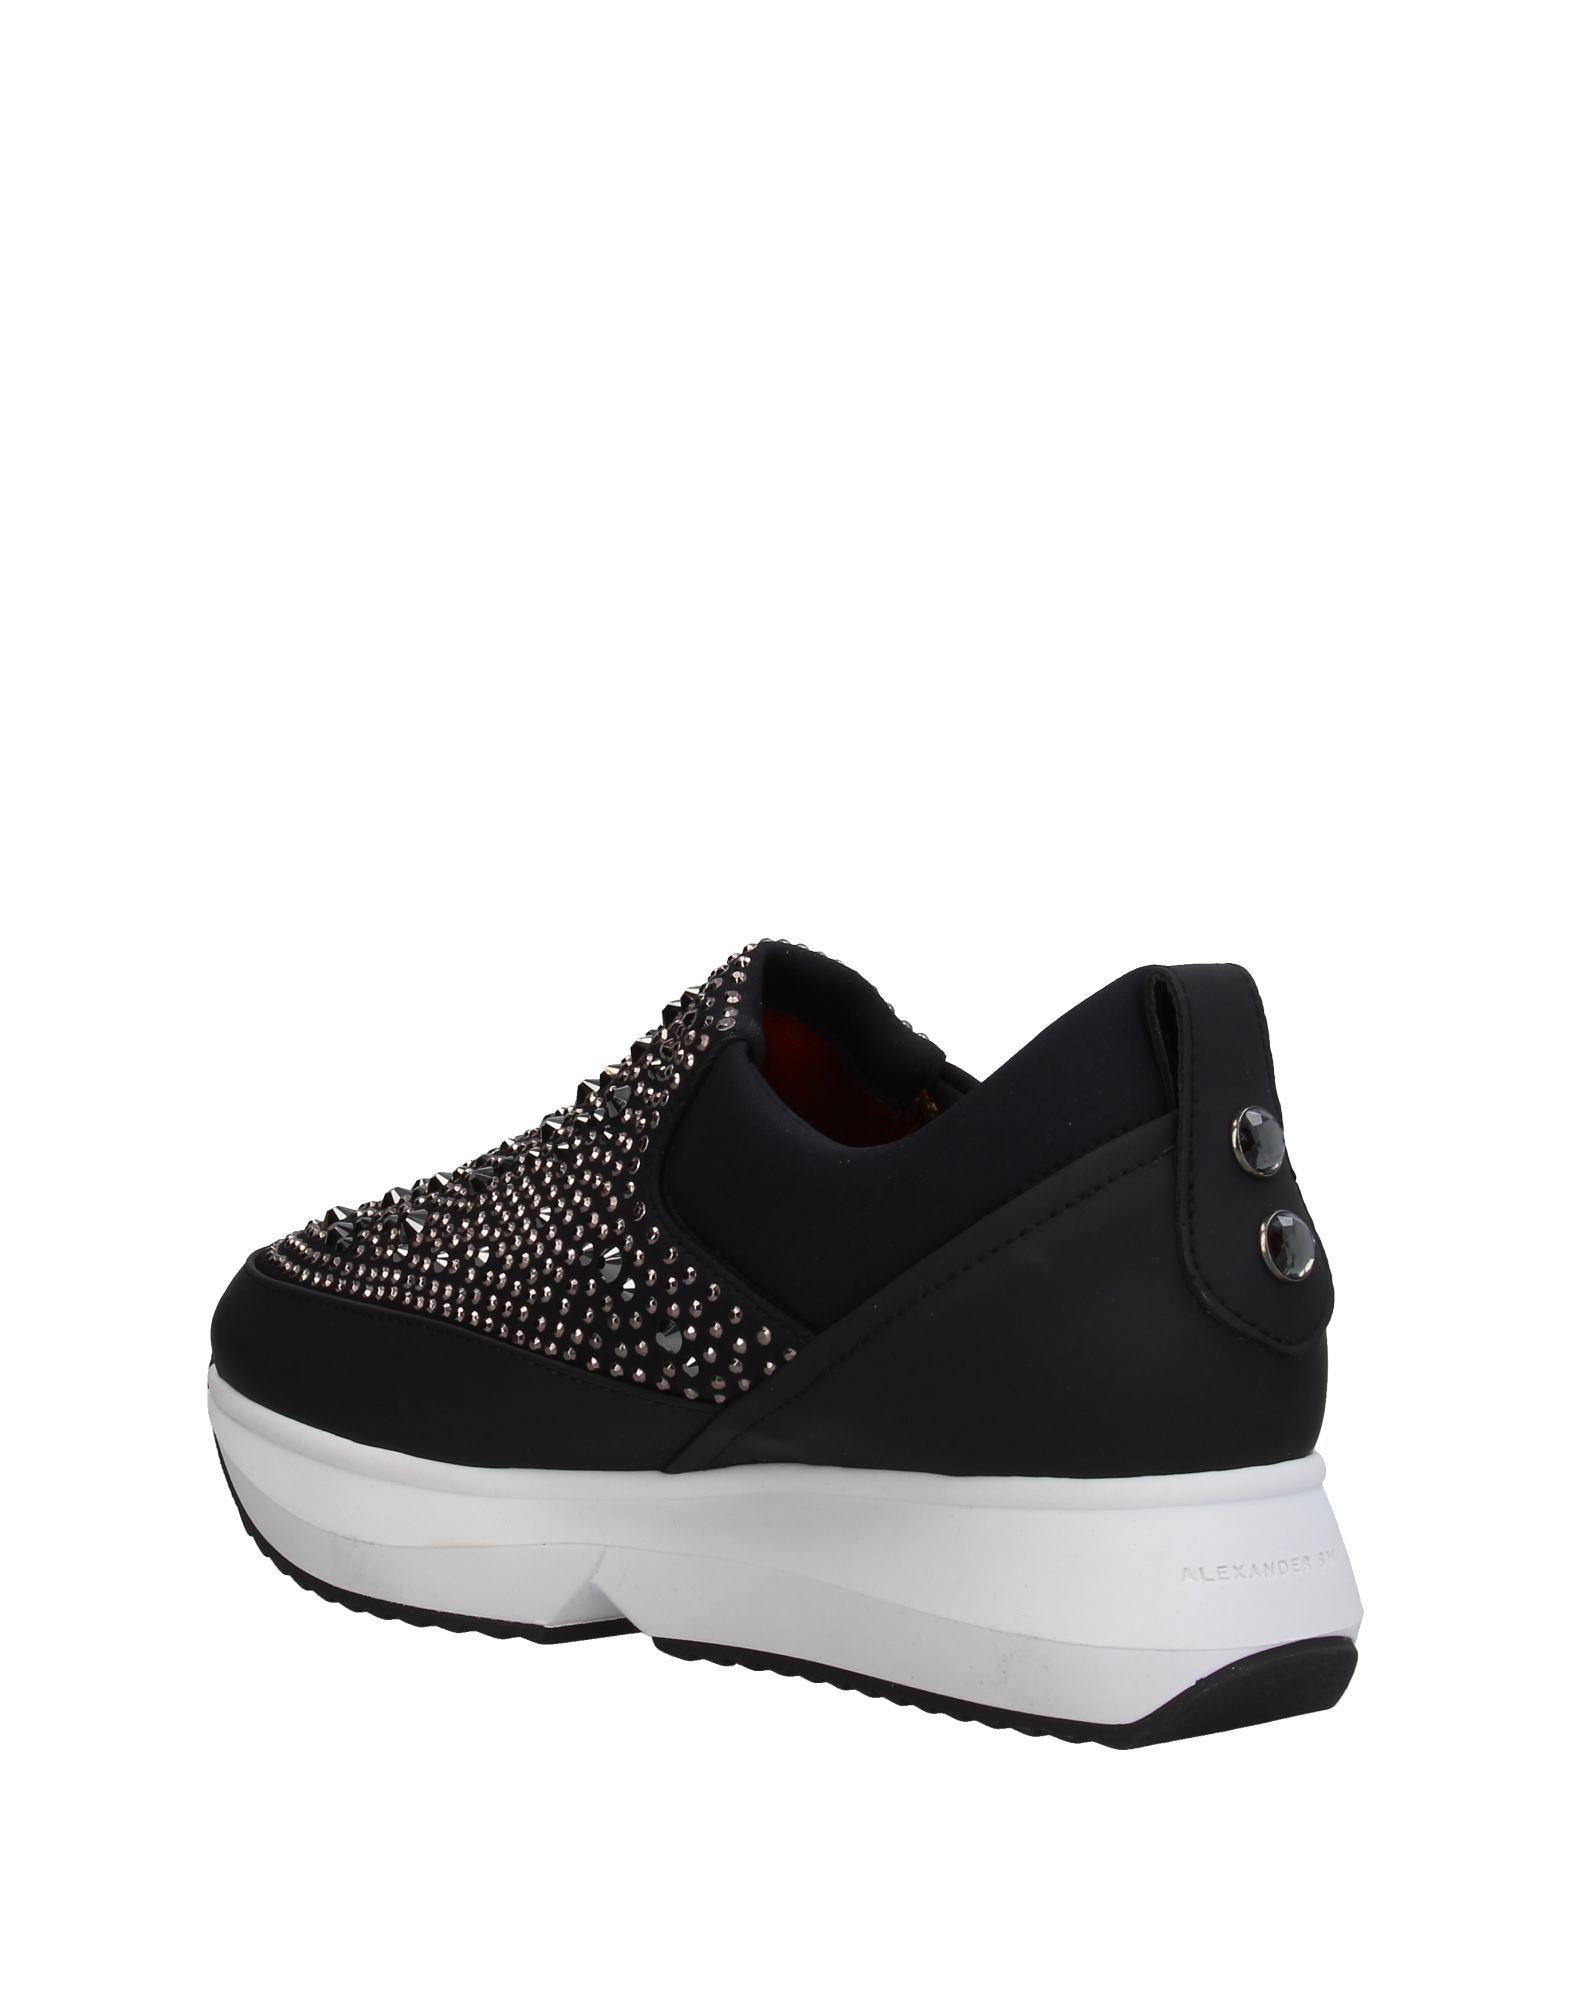 Stilvolle Sneakers billige Schuhe Alexander Smith Sneakers Stilvolle Damen  11390702XV 241aac